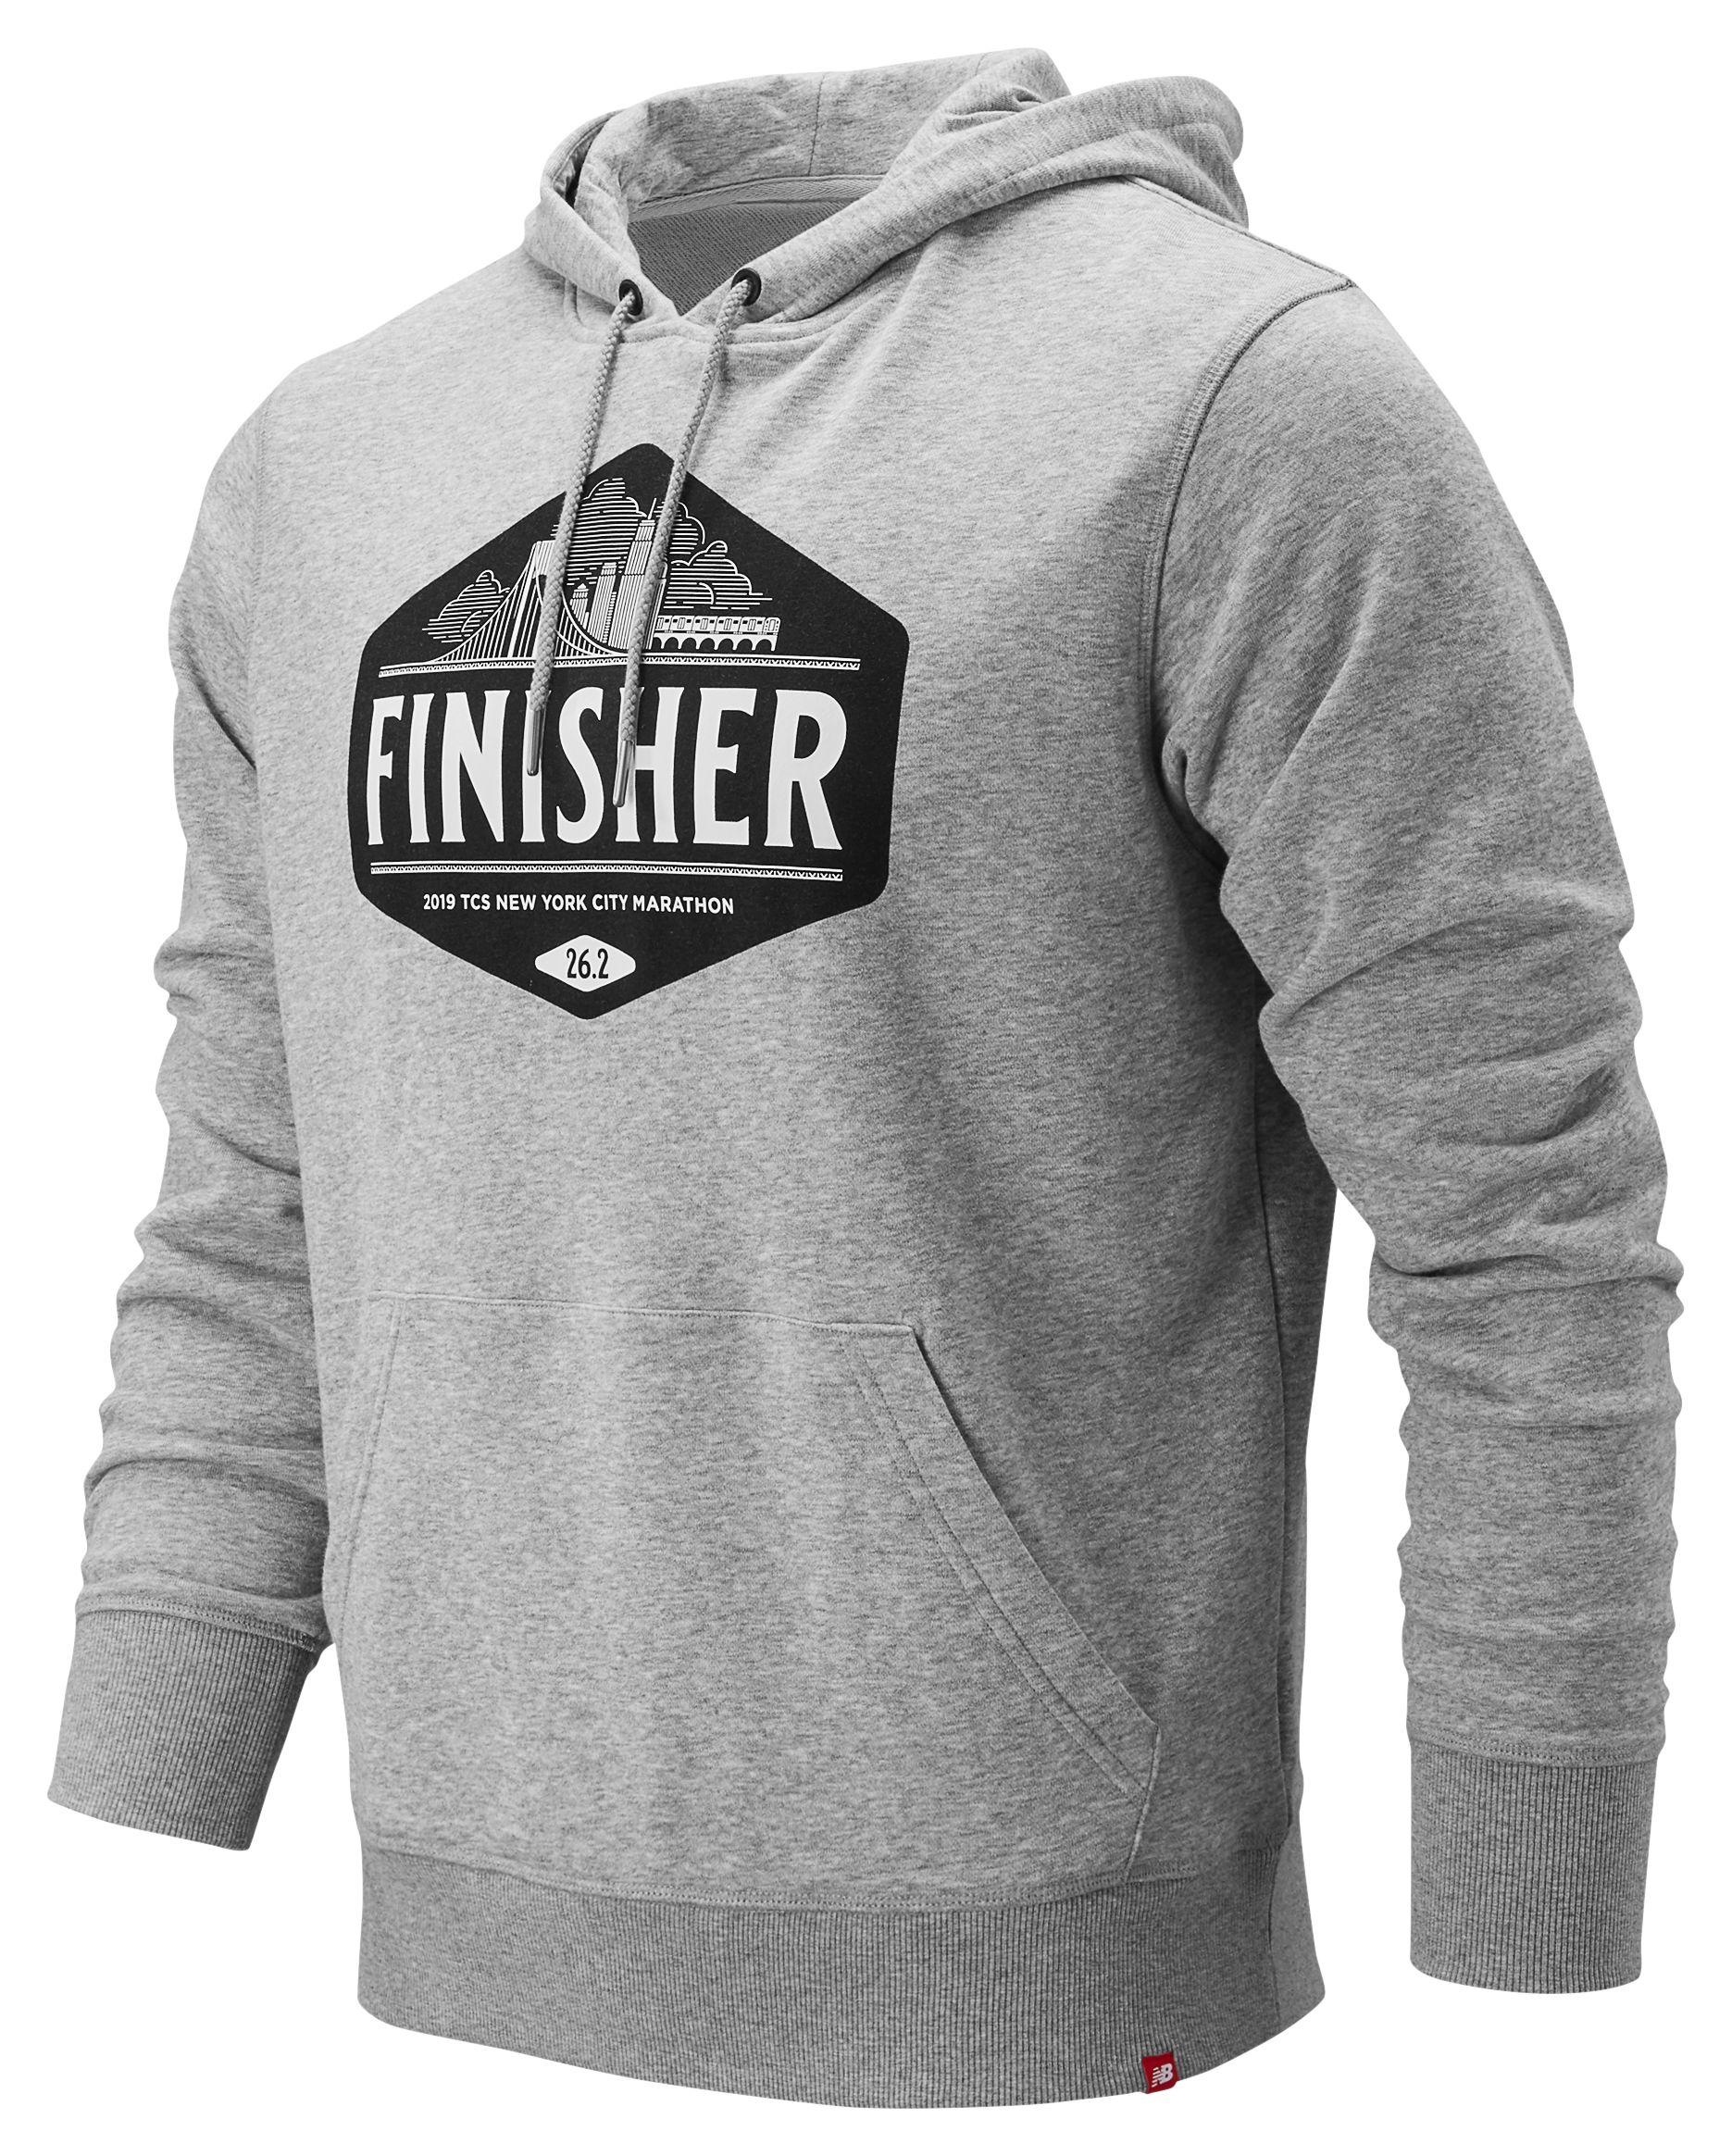 Men's 2019 NYC Marathon Finisher Hoodie